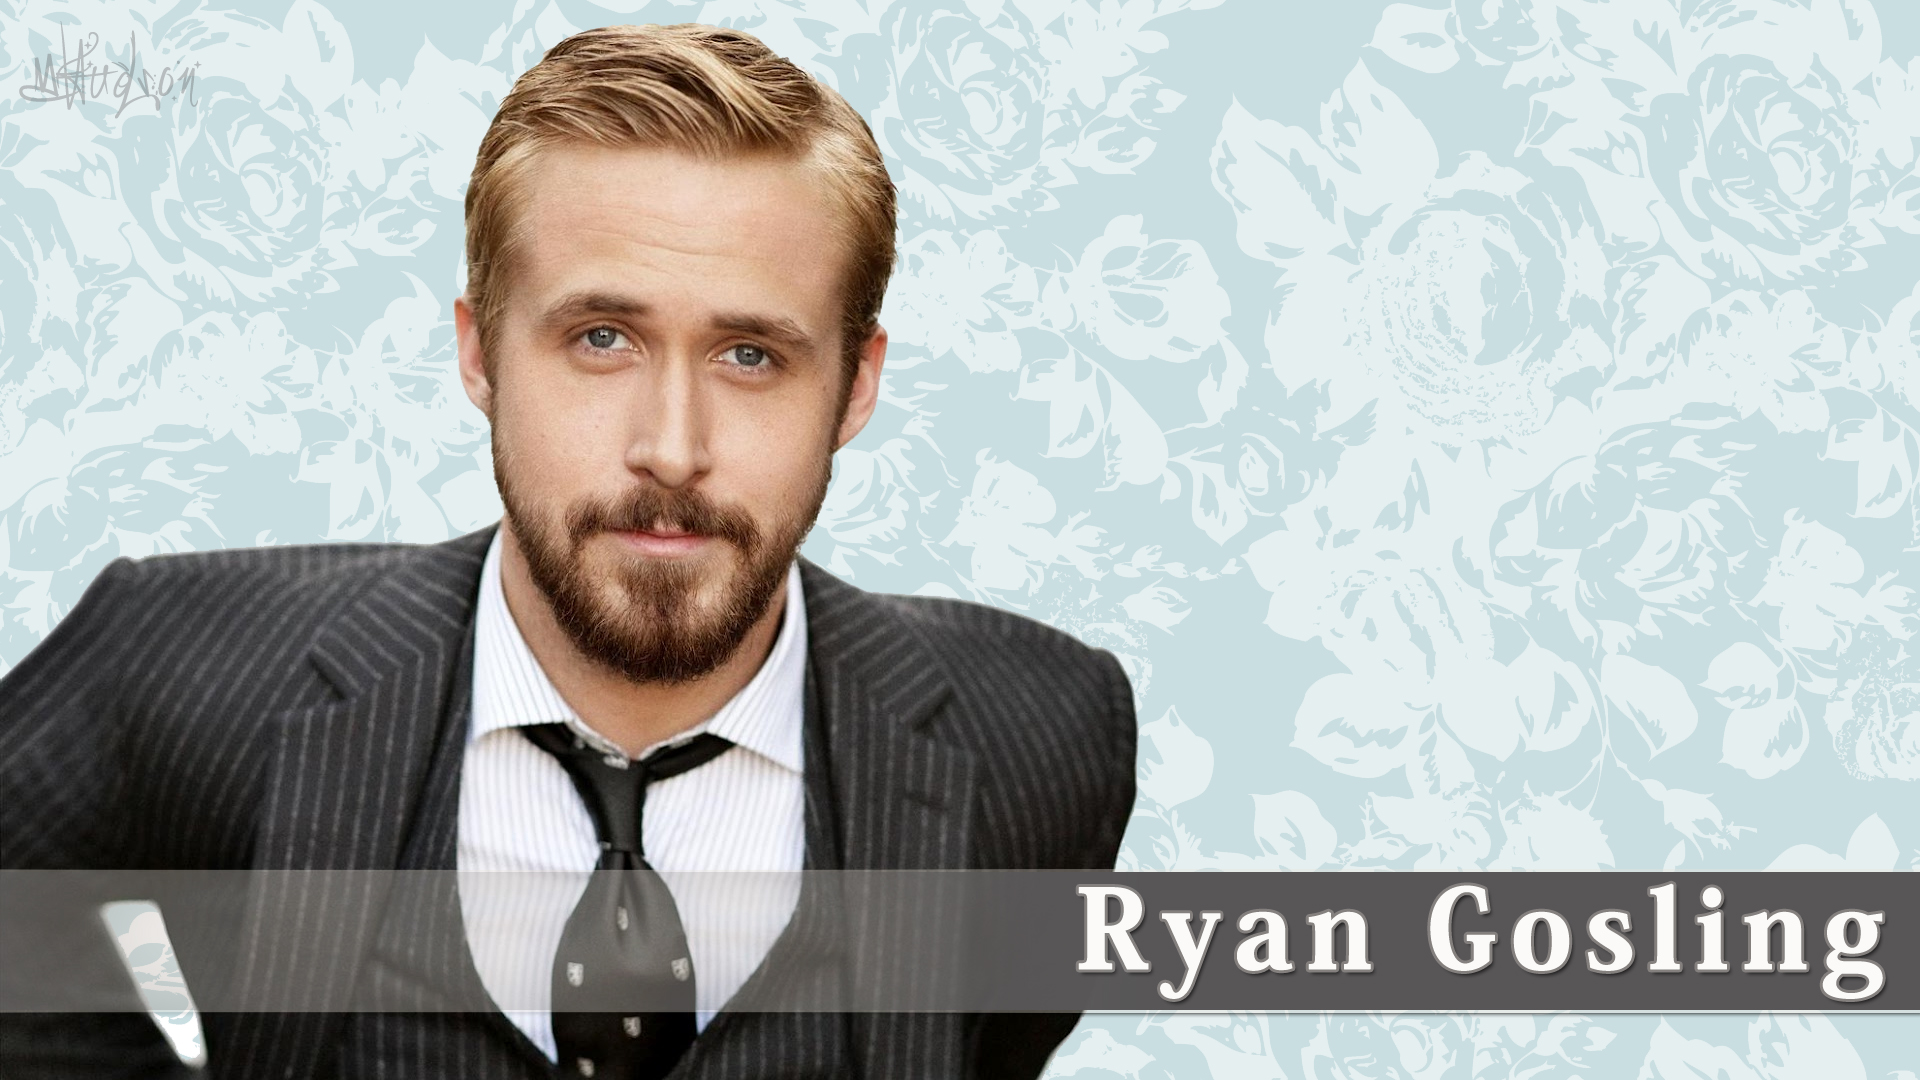 Ryan Gosling Wallpaper by Cassaria 1920x1080